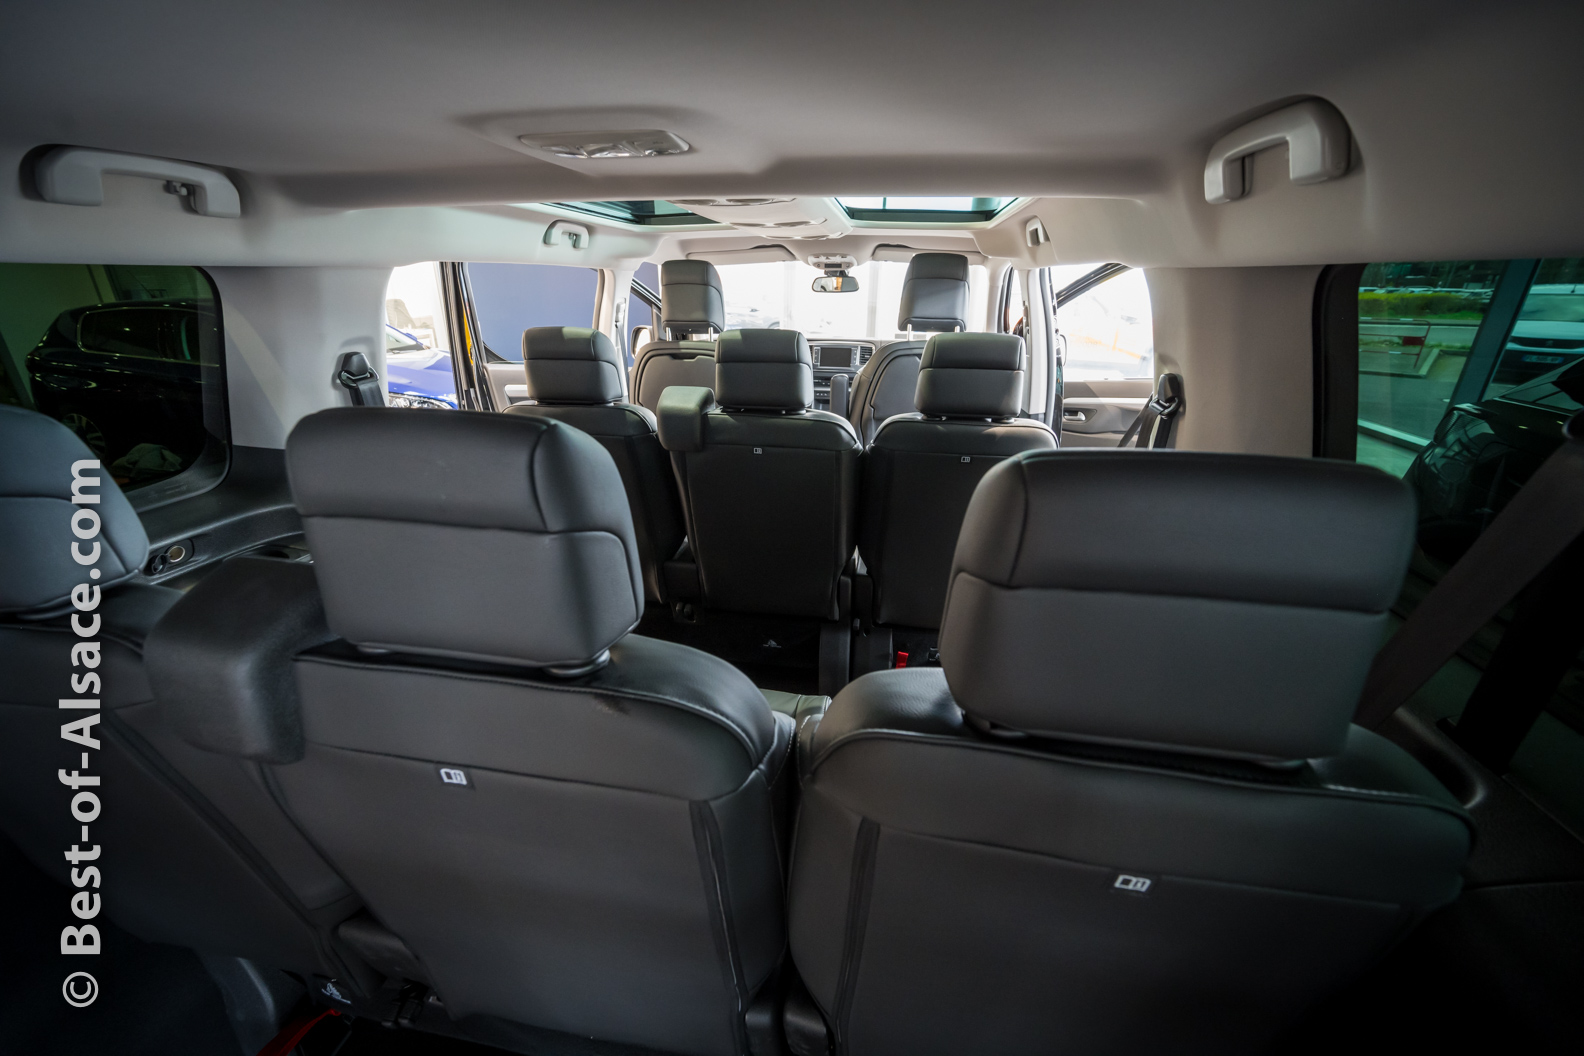 Oiseau-Migrateur-minivan-12MAR2020-7532